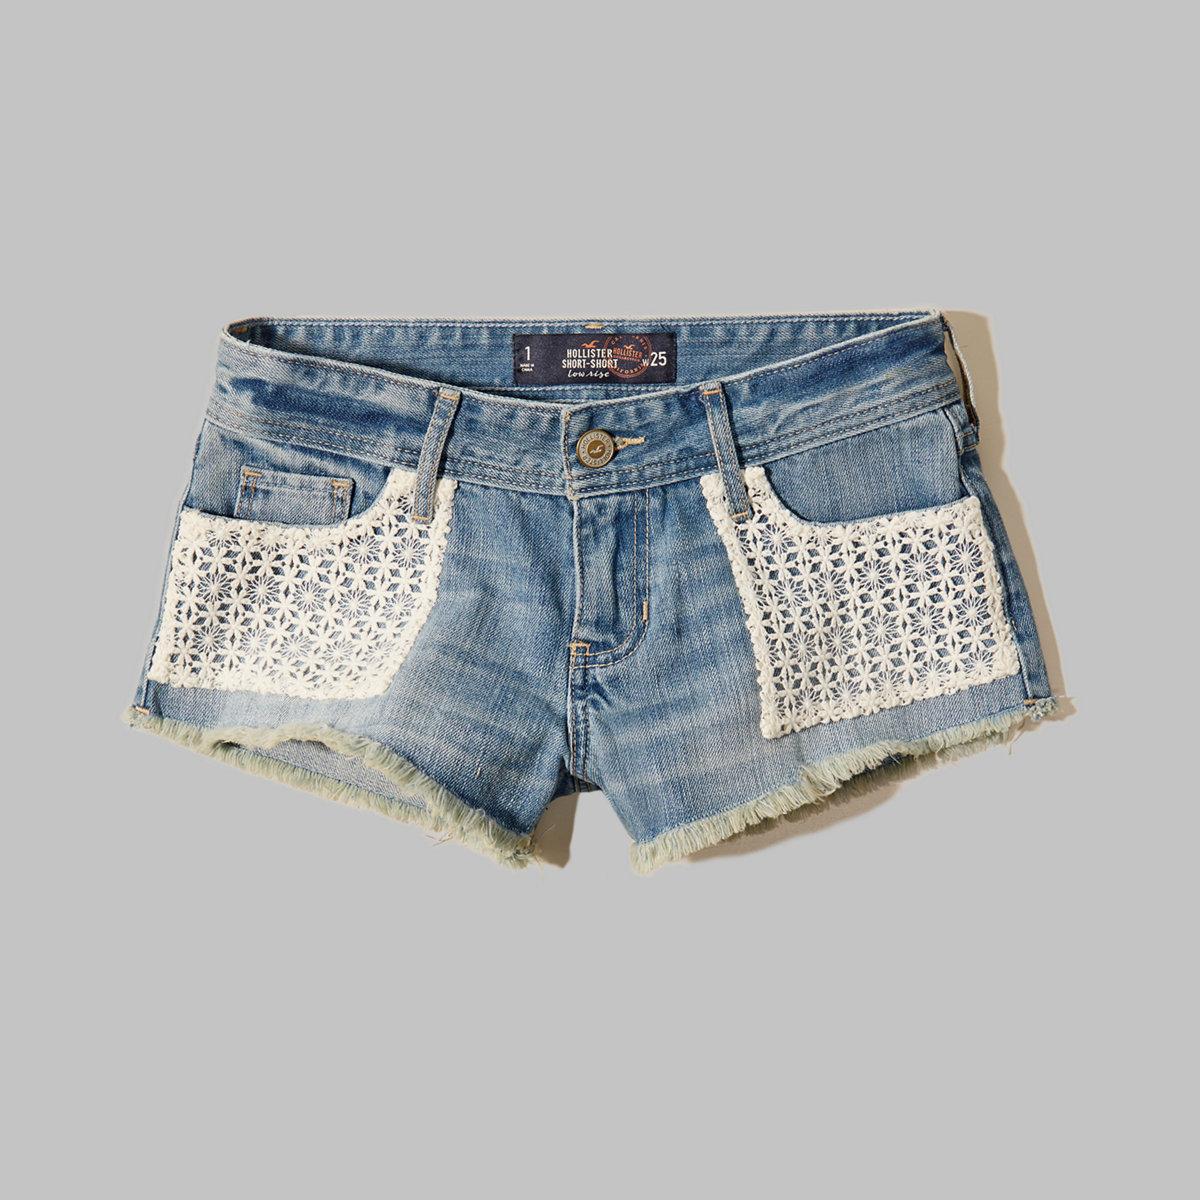 Hollister Low Rise Denim Shorts